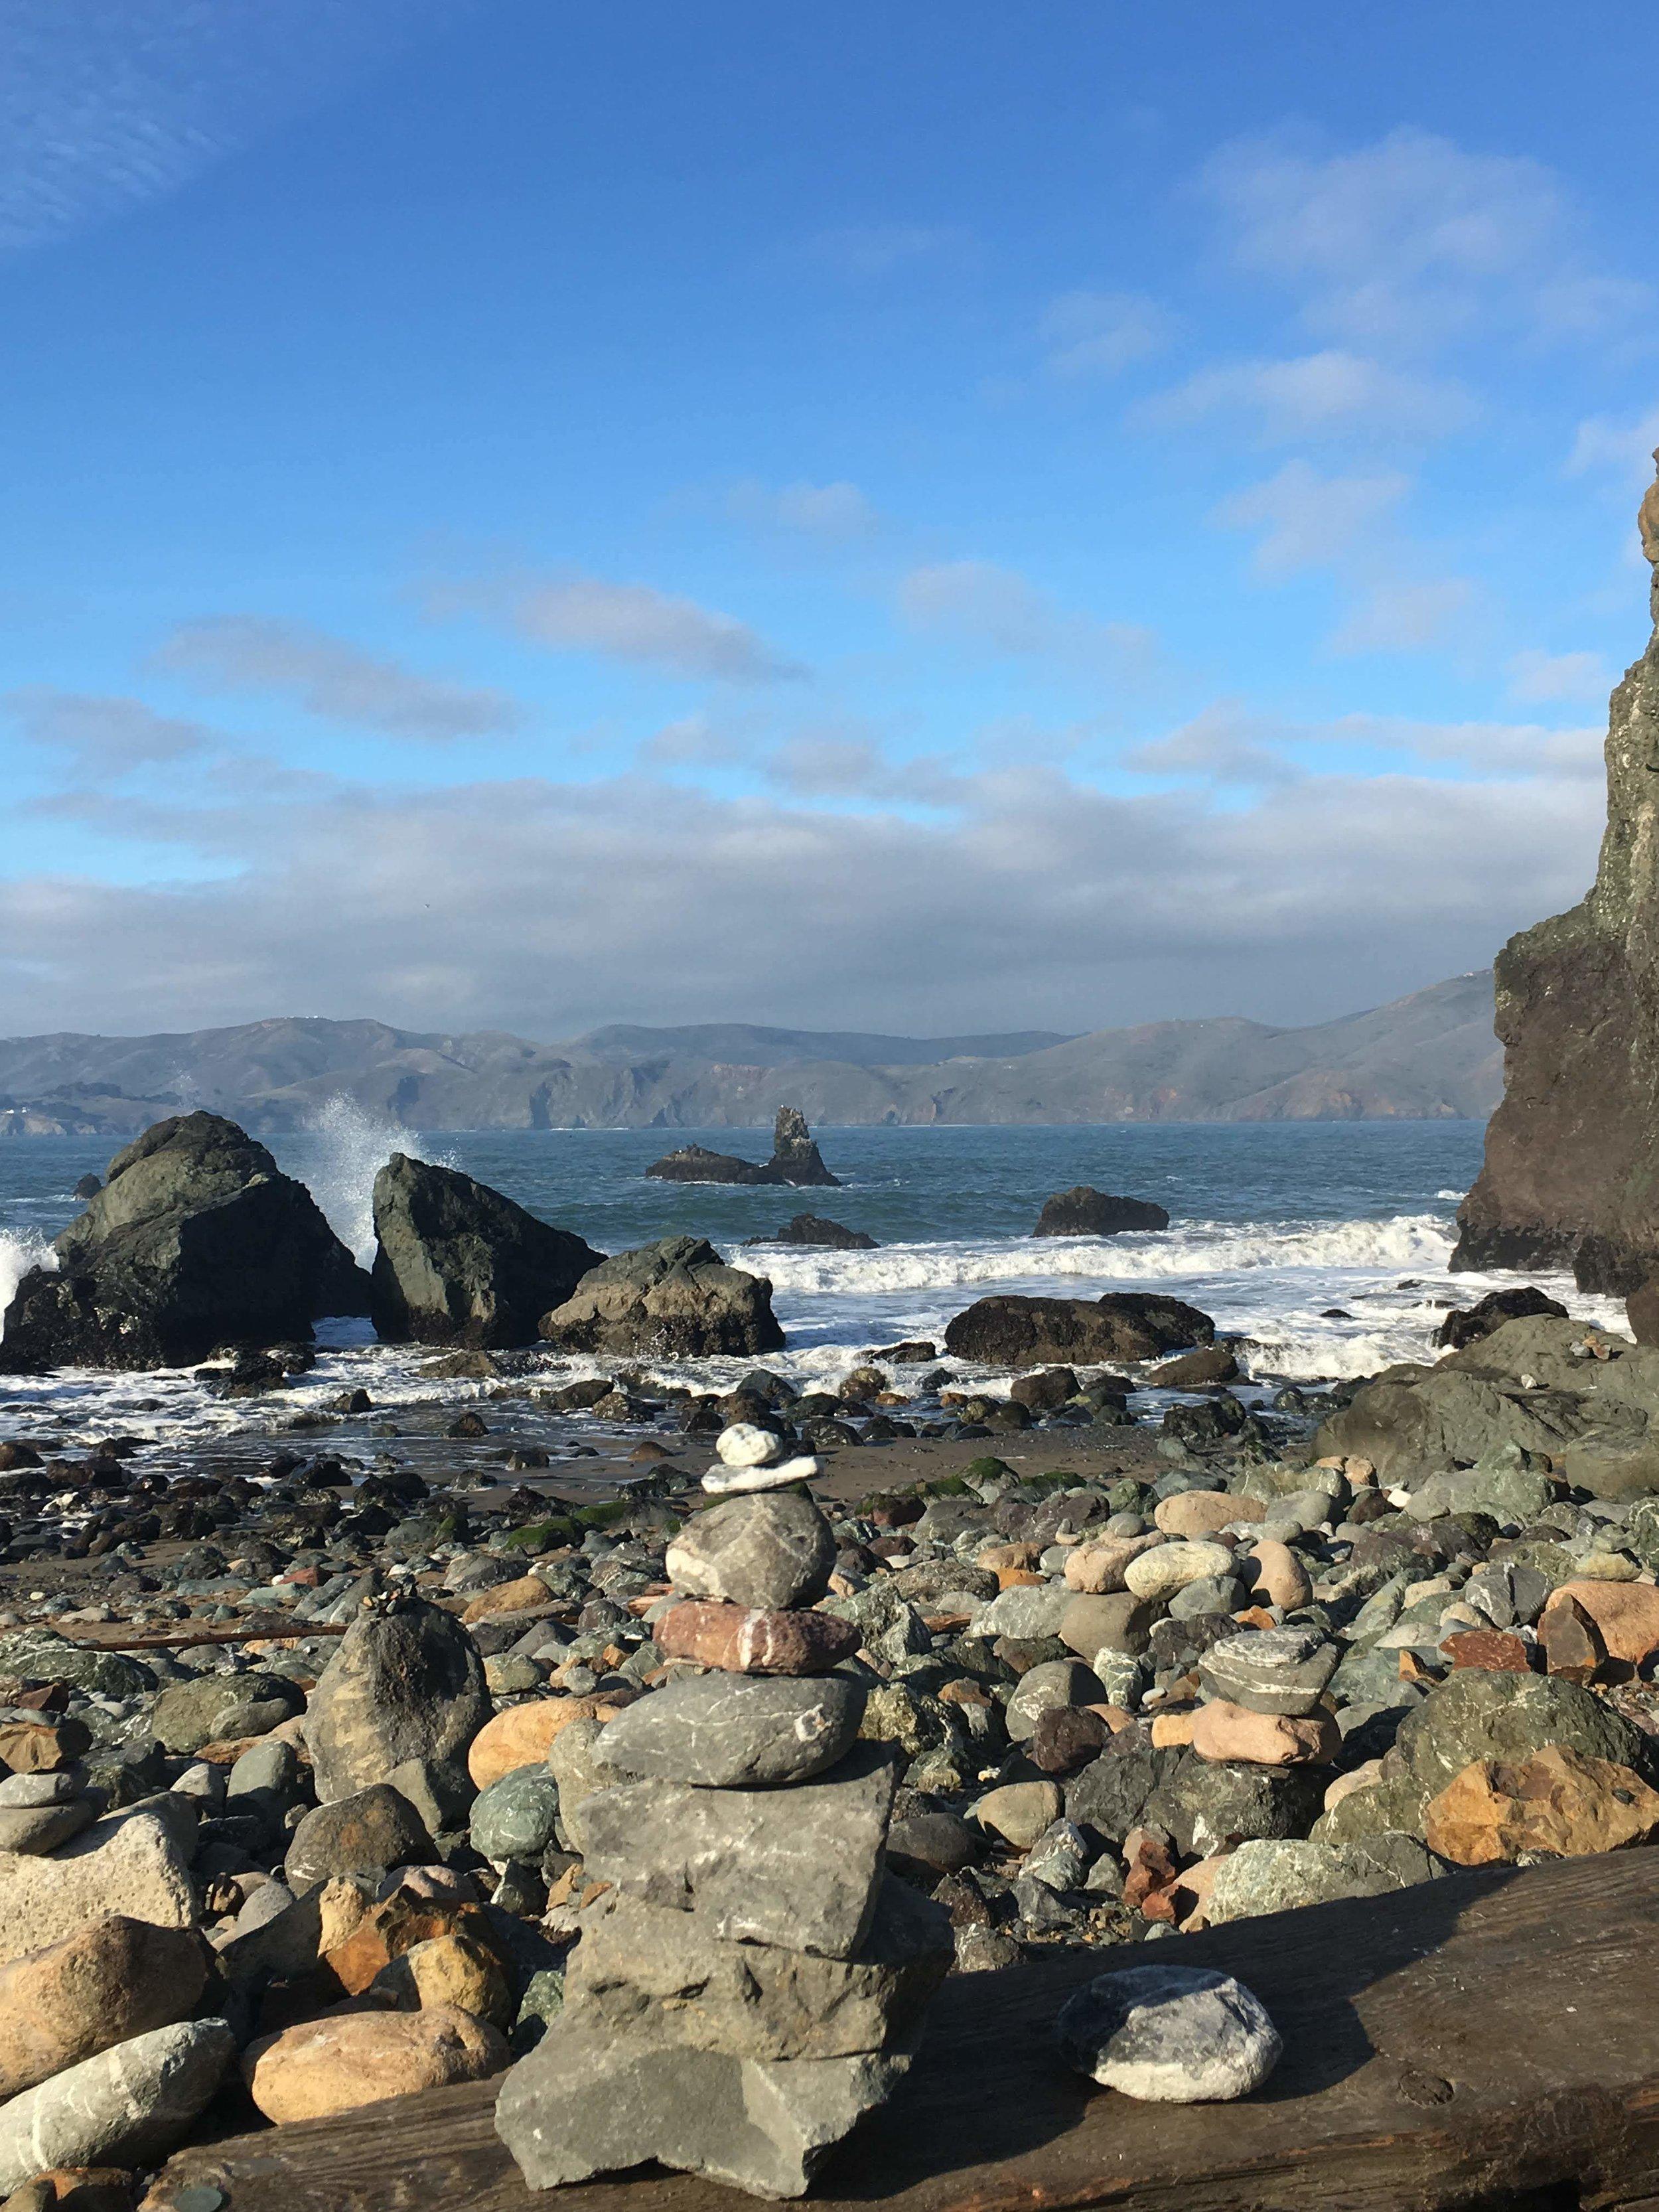 rocks at beach.jpg